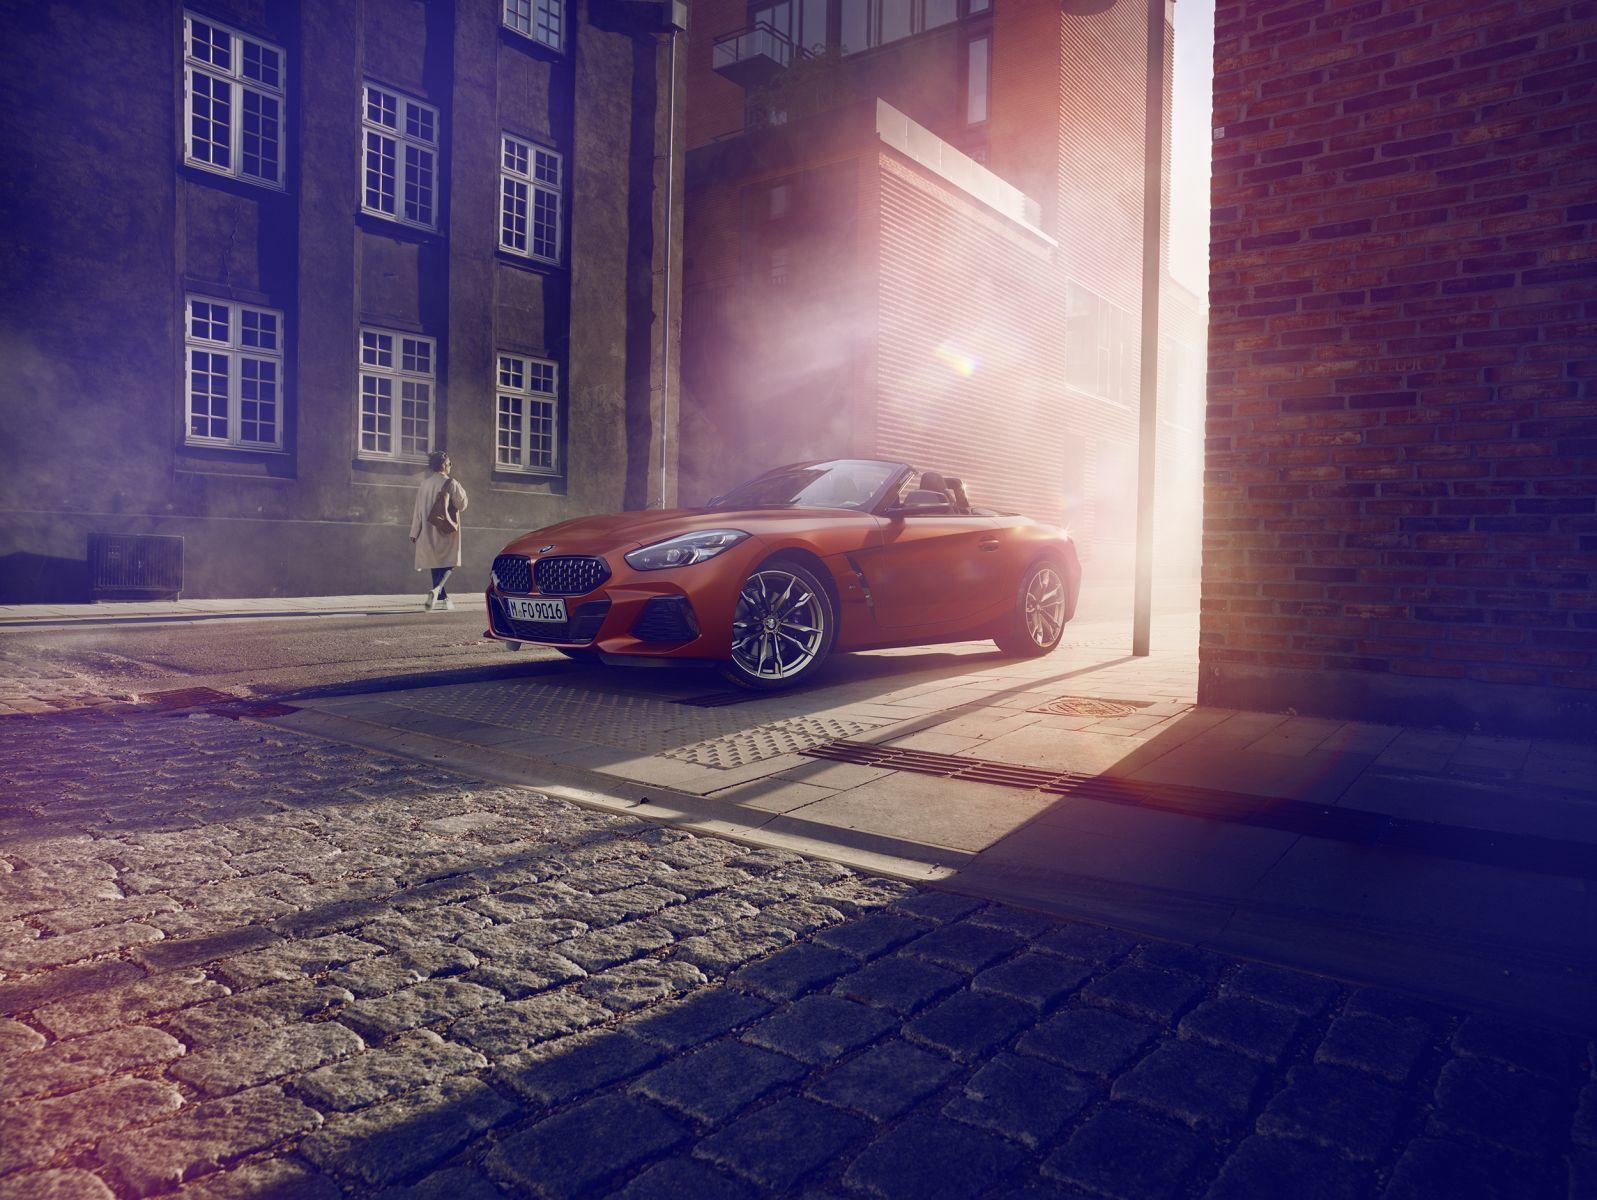 TORSTEN KLINKOW :  BMW Z4 first edition